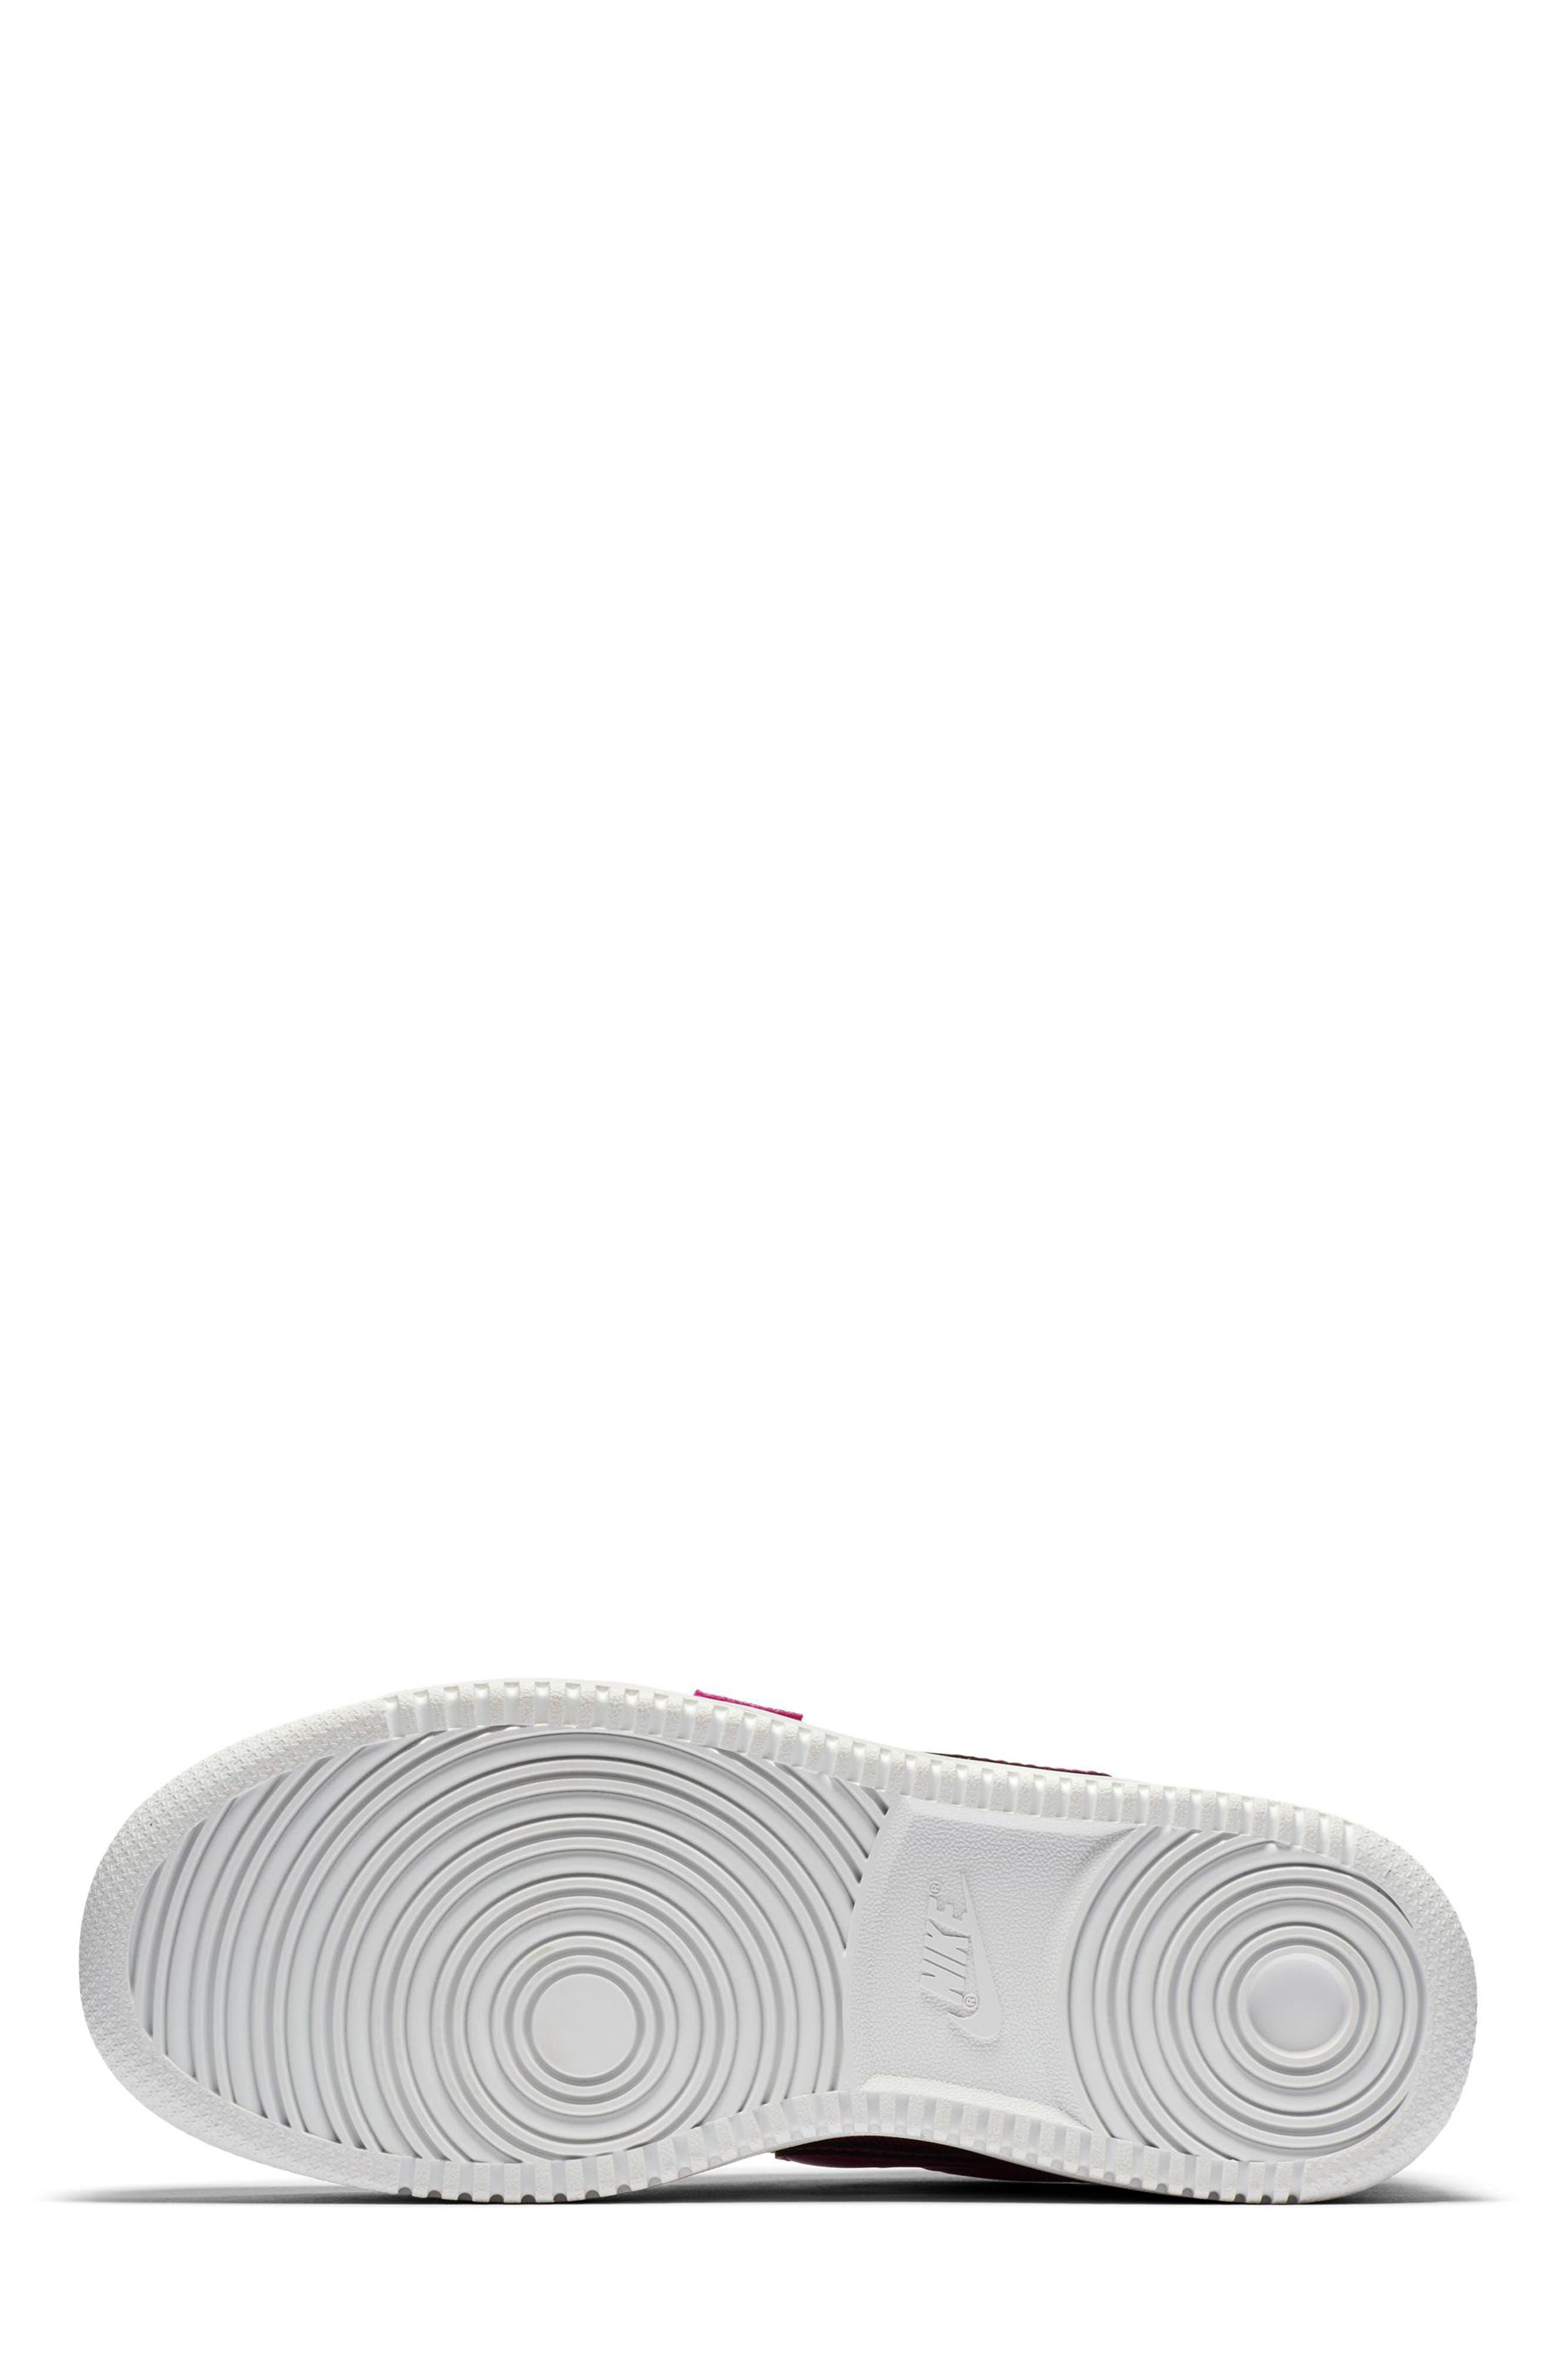 Vandal 2K Sneaker,                             Alternate thumbnail 5, color,                             HYPER MAGENTA/ SUMMIT/ FUCHSIA